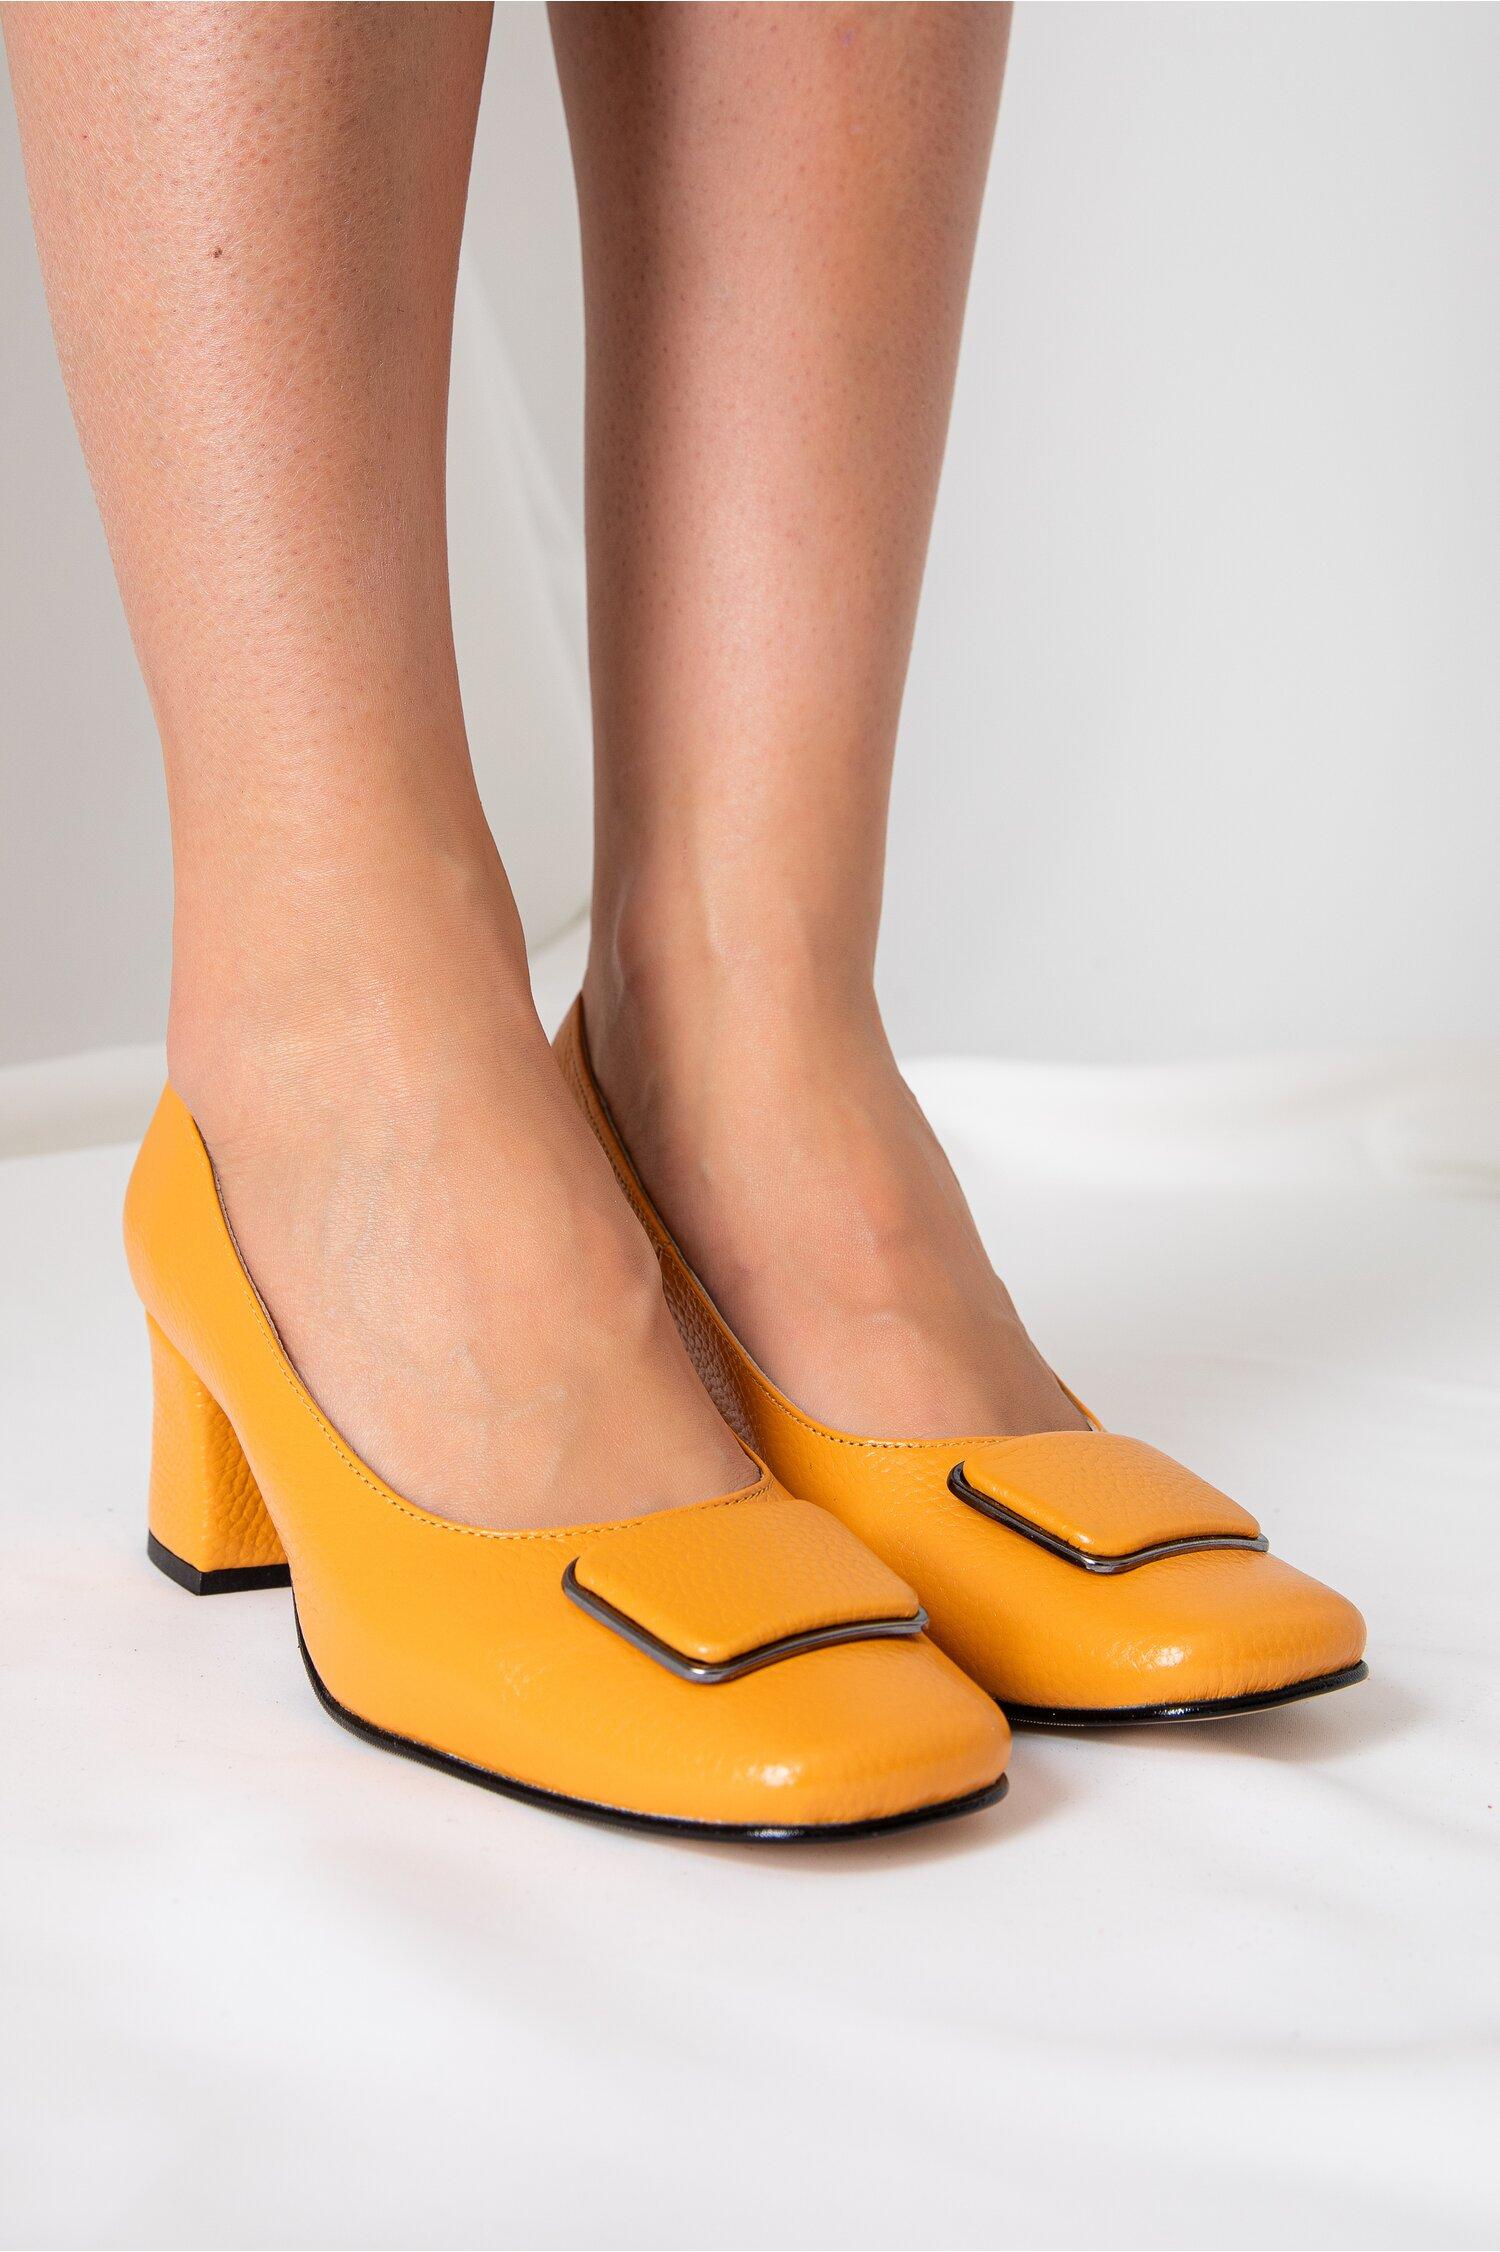 Pantofi Daria galben mustar cu aplicatie pe varf